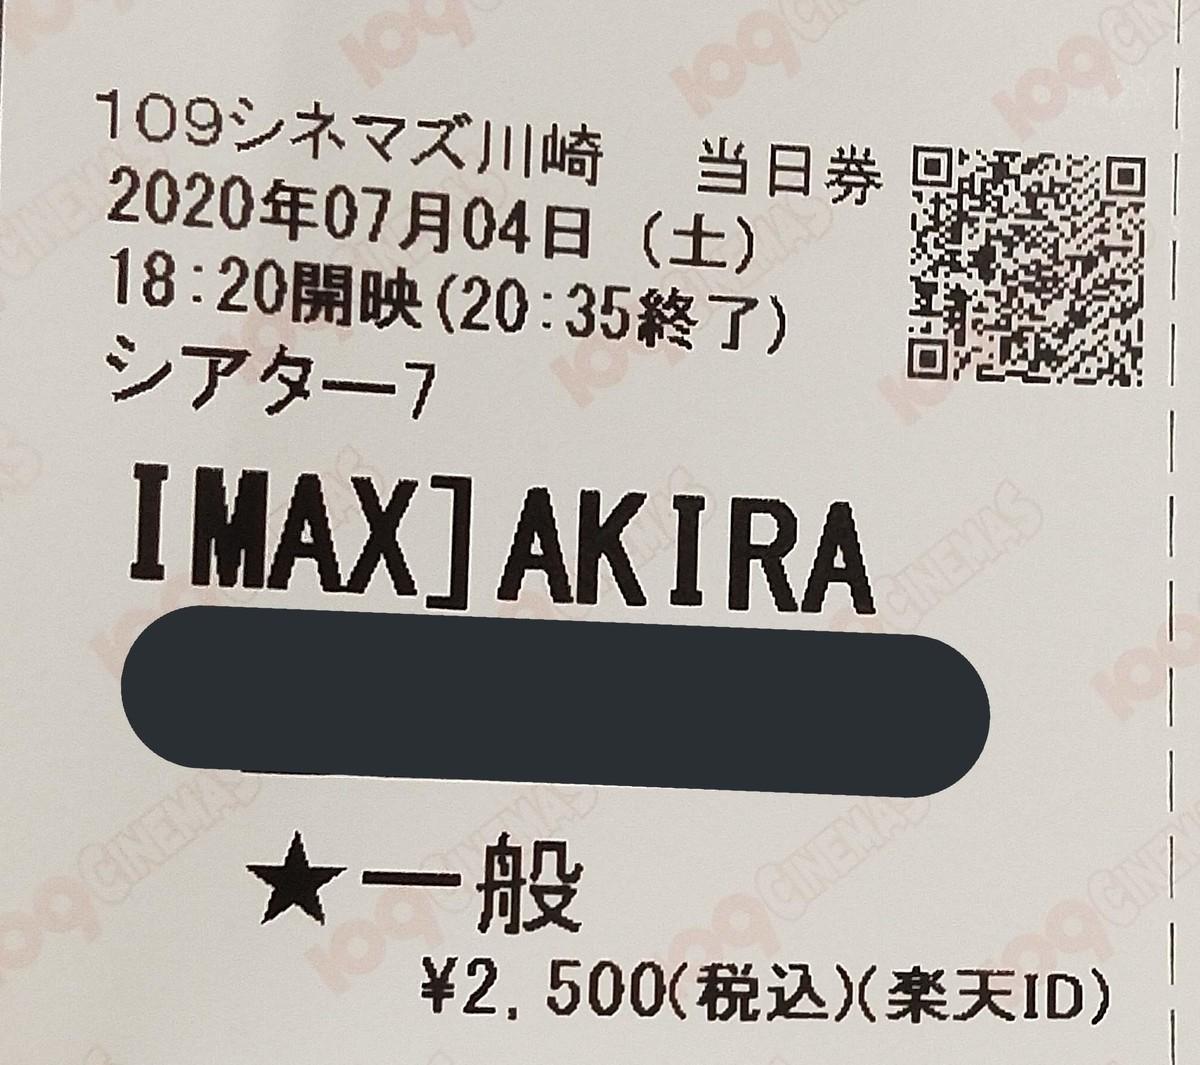 IMAXのAKIRA シネマズ川崎で見てきました